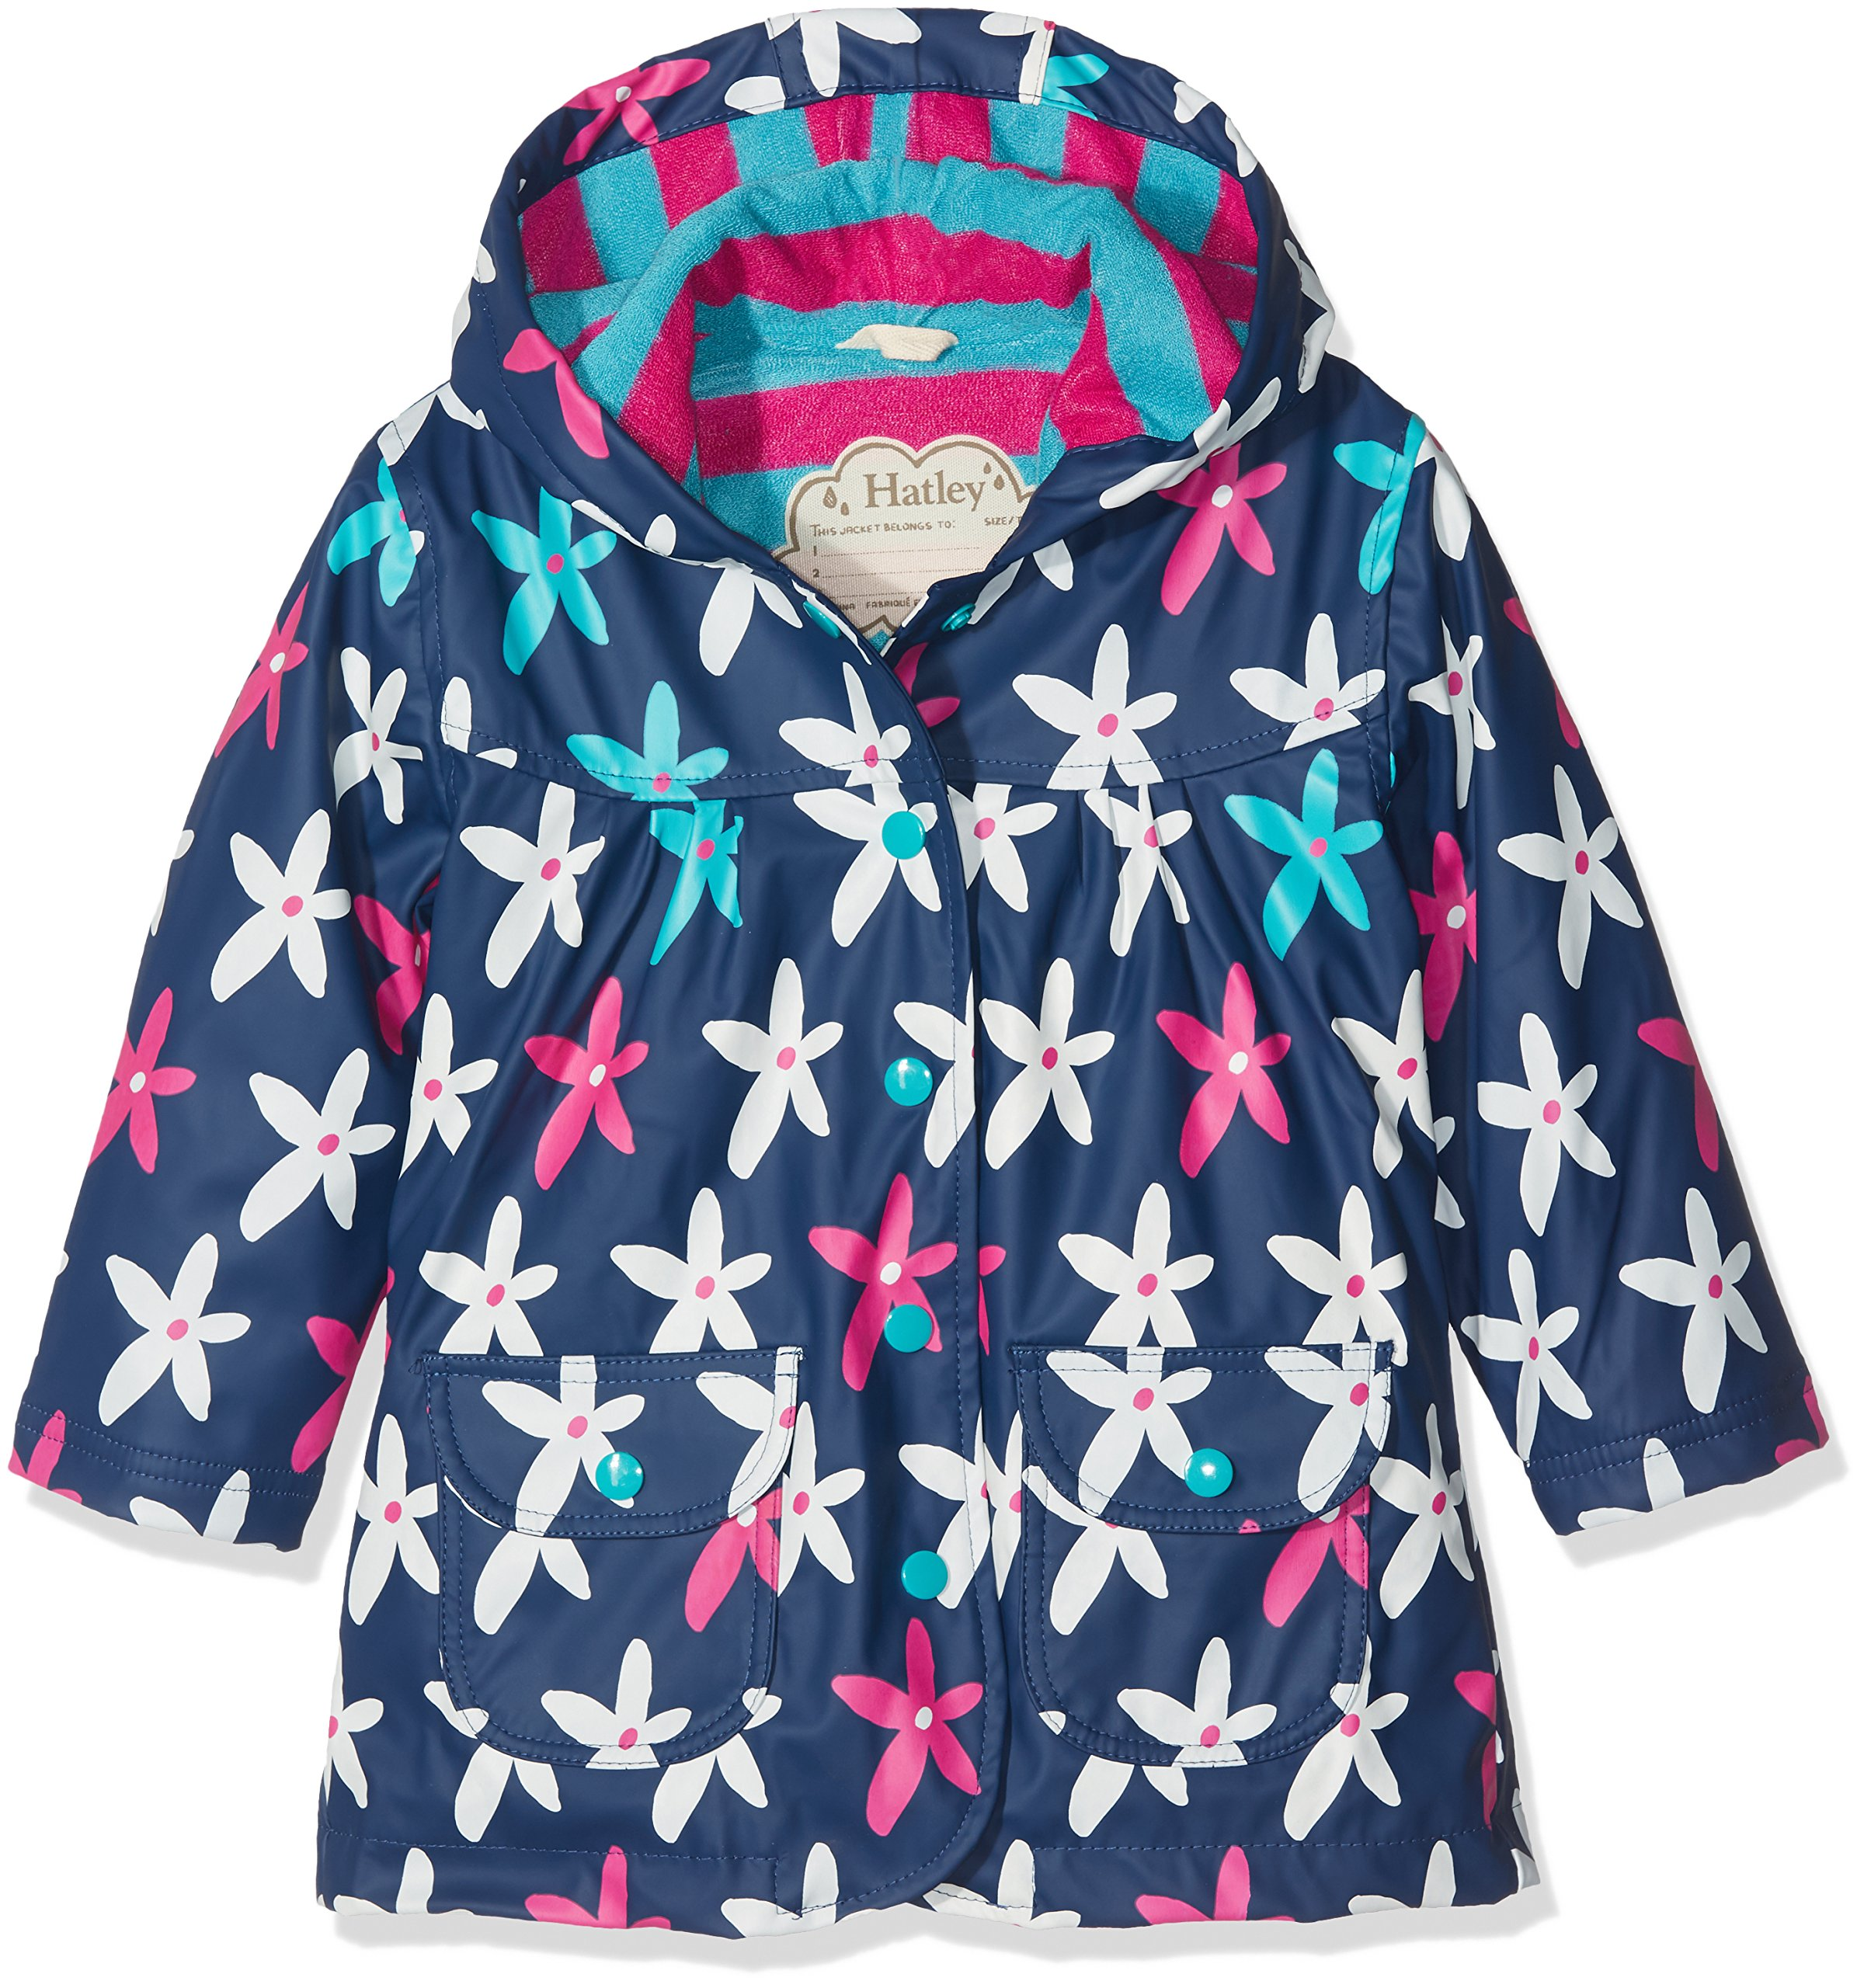 Hatley Girls' Little Printed Raincoats, Starflower, 2